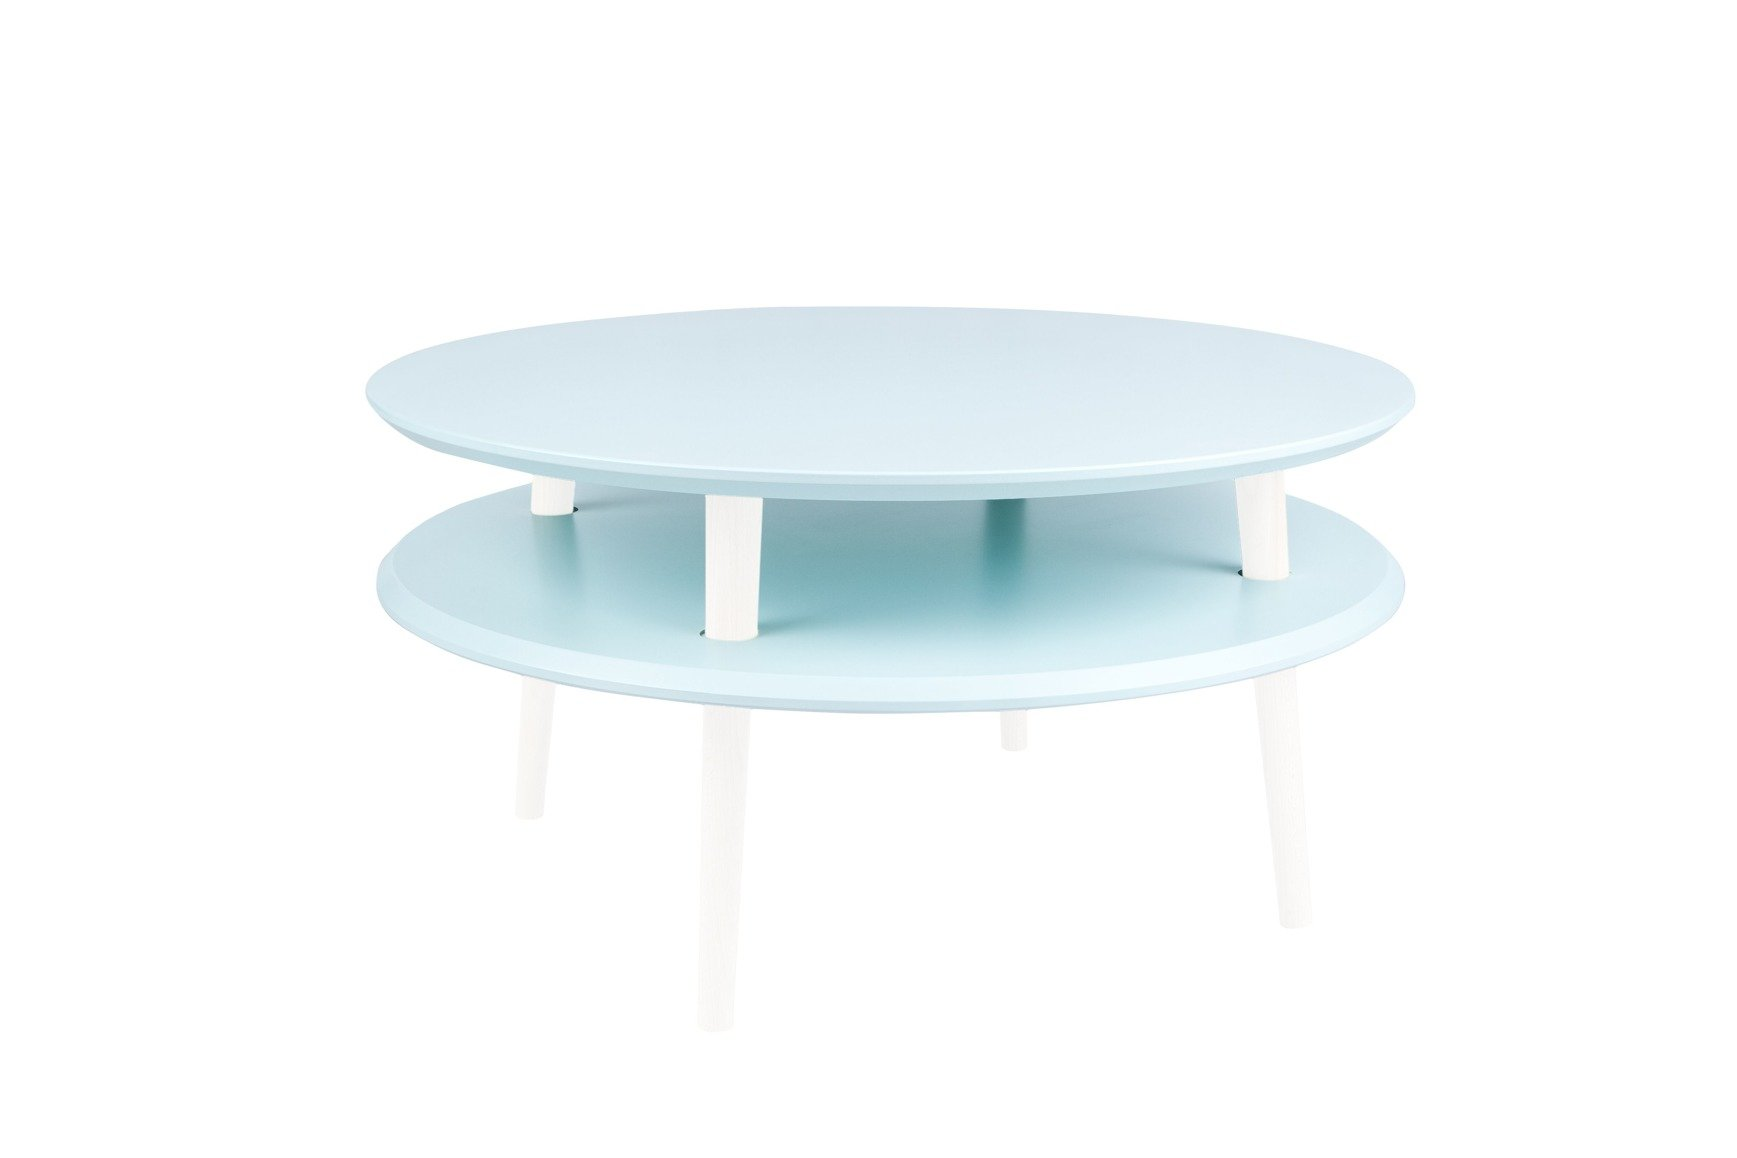 Ufo Coffee Table Diam 70cm X Height 35cm Light Turquoise White Ragaba De